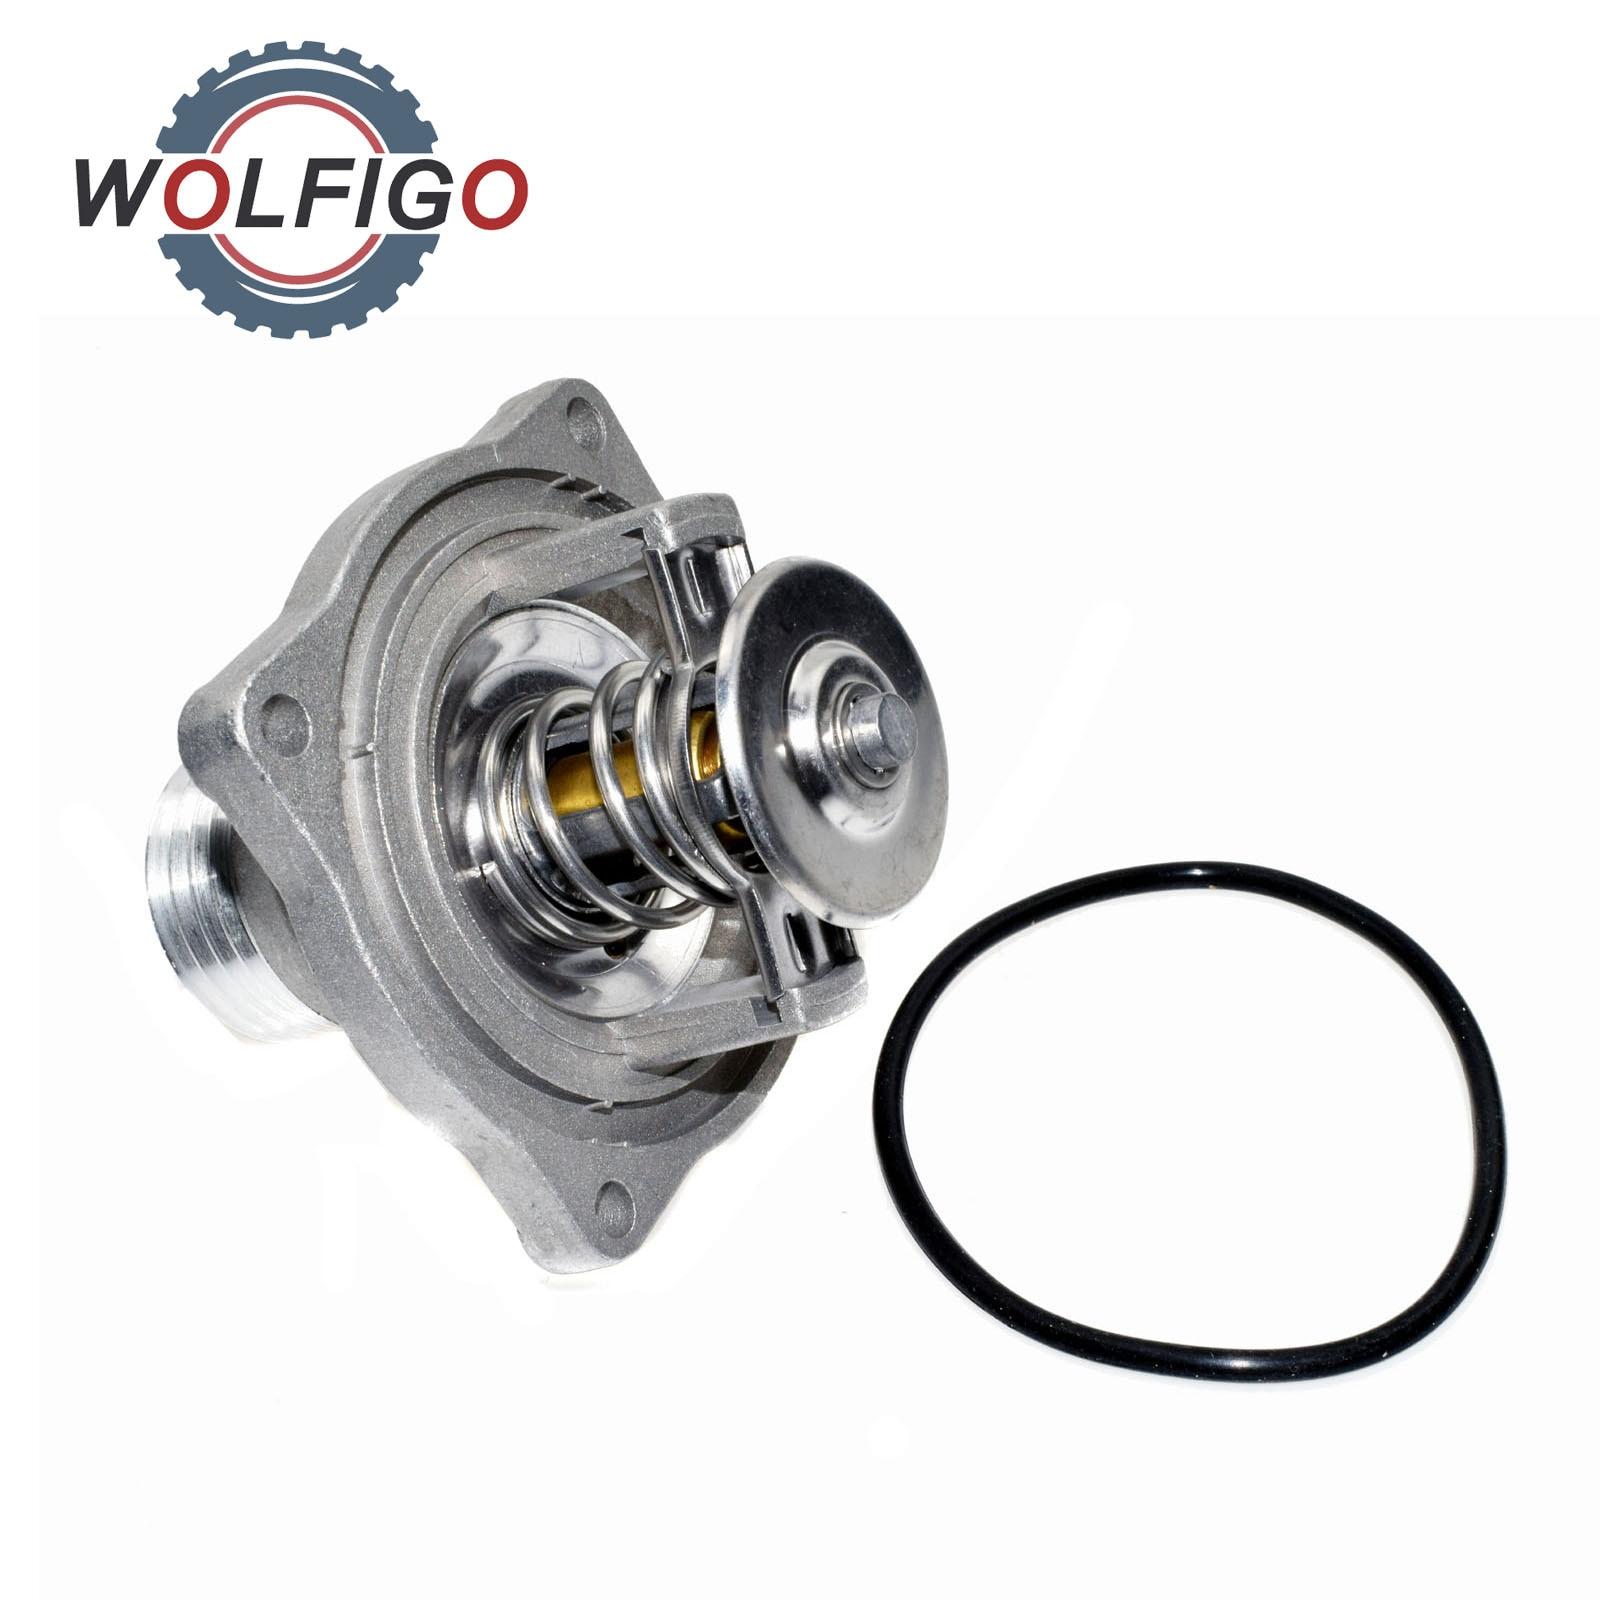 WOLFIGO Motor Kühlmittel Thermostat Montage Für BMW E39 E38 535i 540i 735i 735iL 740i 740iL M62 4.0L V8 11531437526 11531704324